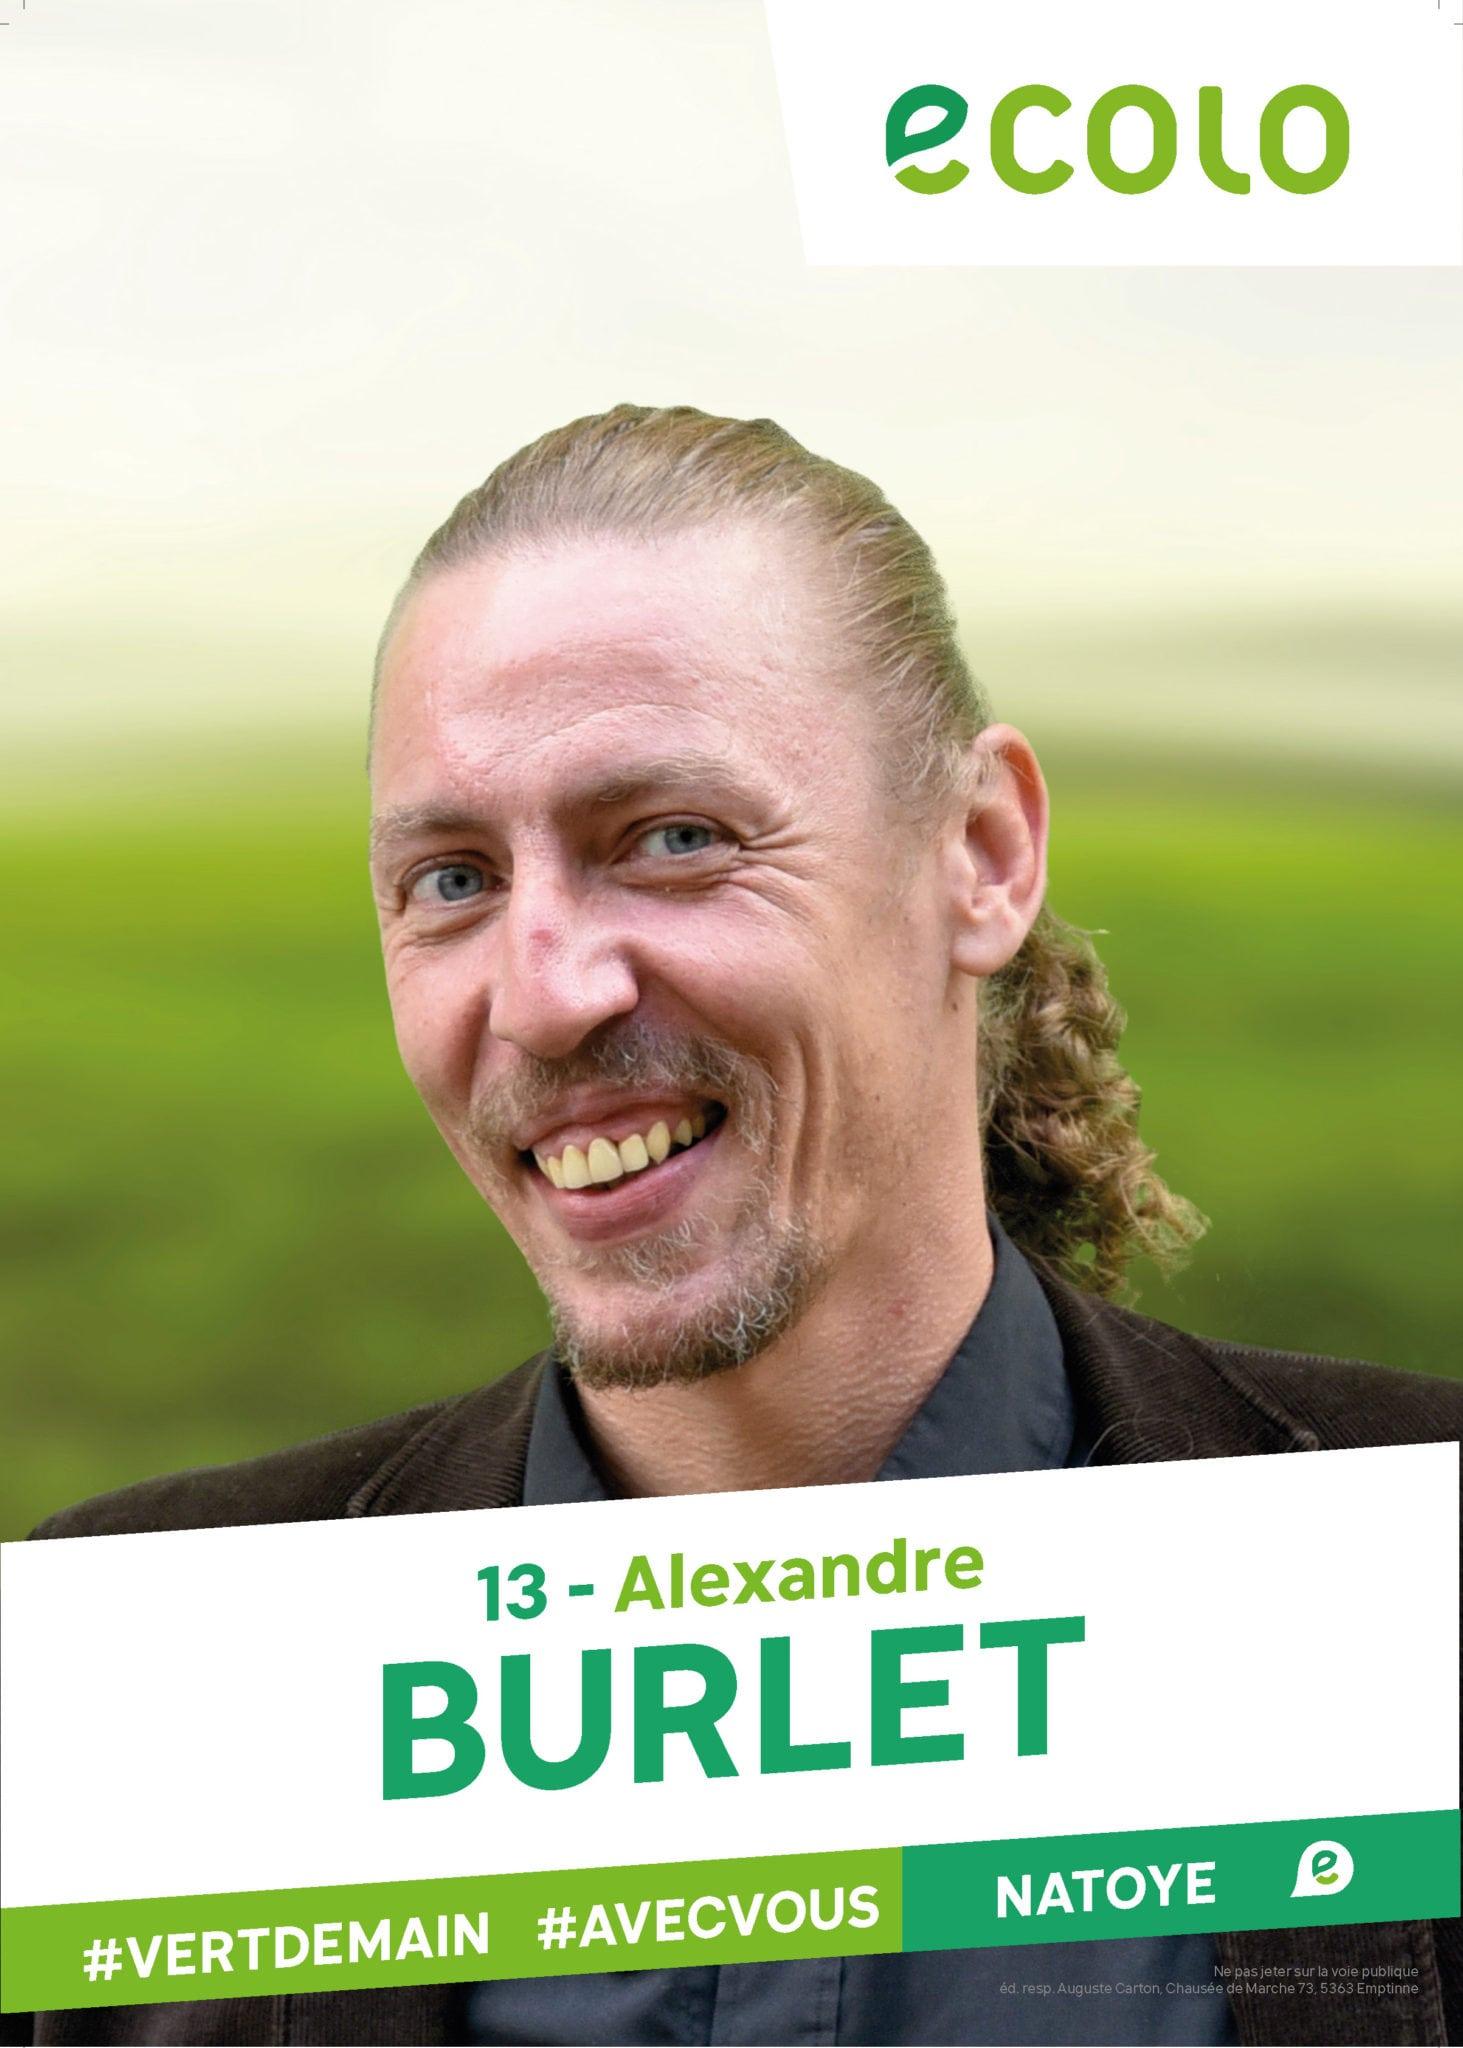 13 - Alexandre BURLET